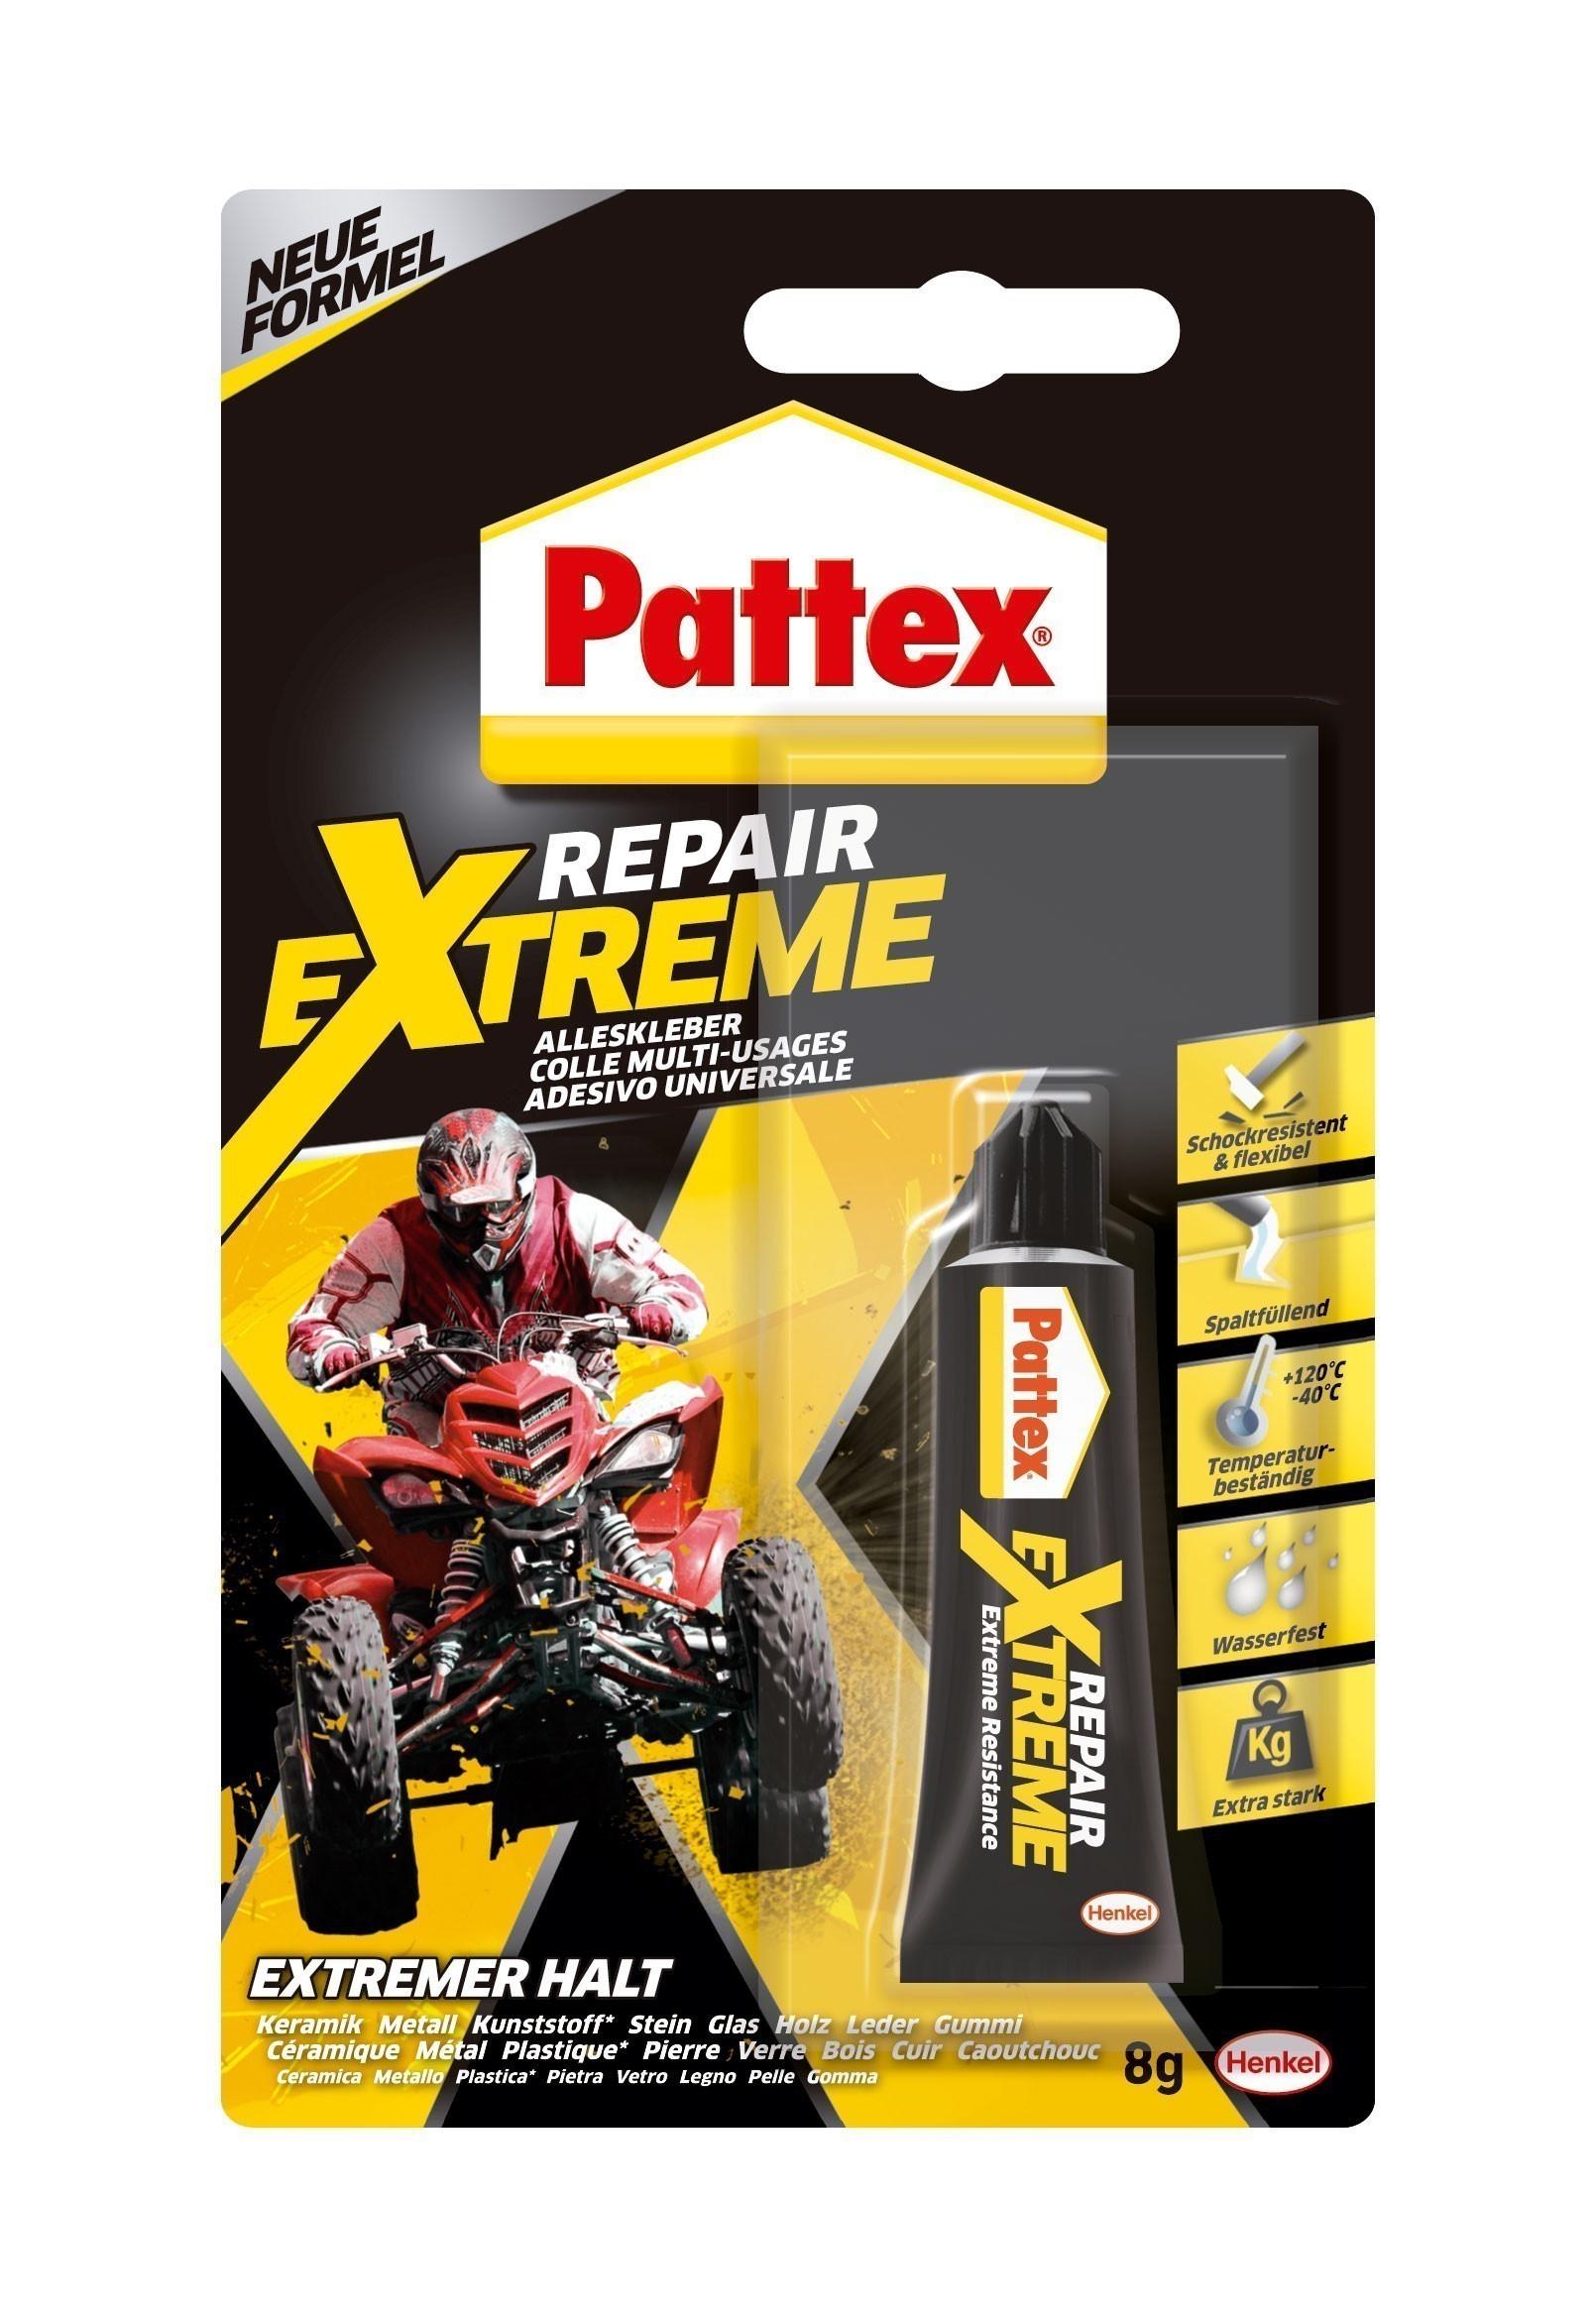 Pattex Alleskleber / 100% Repair Gel 8g Bild 1